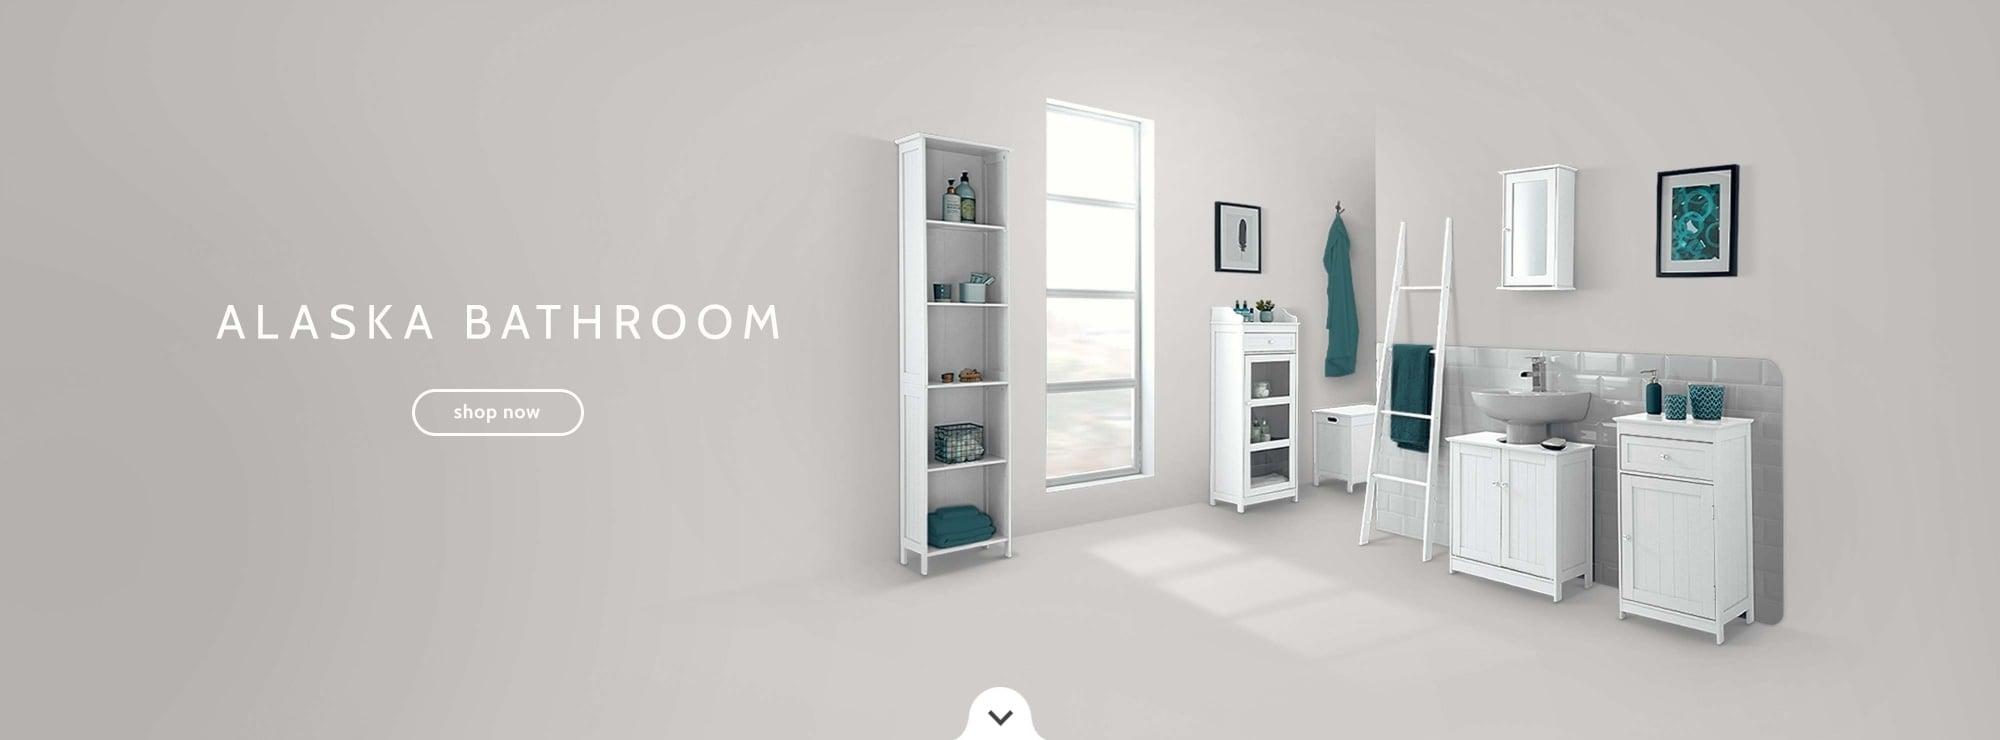 LPD Alaska Bathroom collection